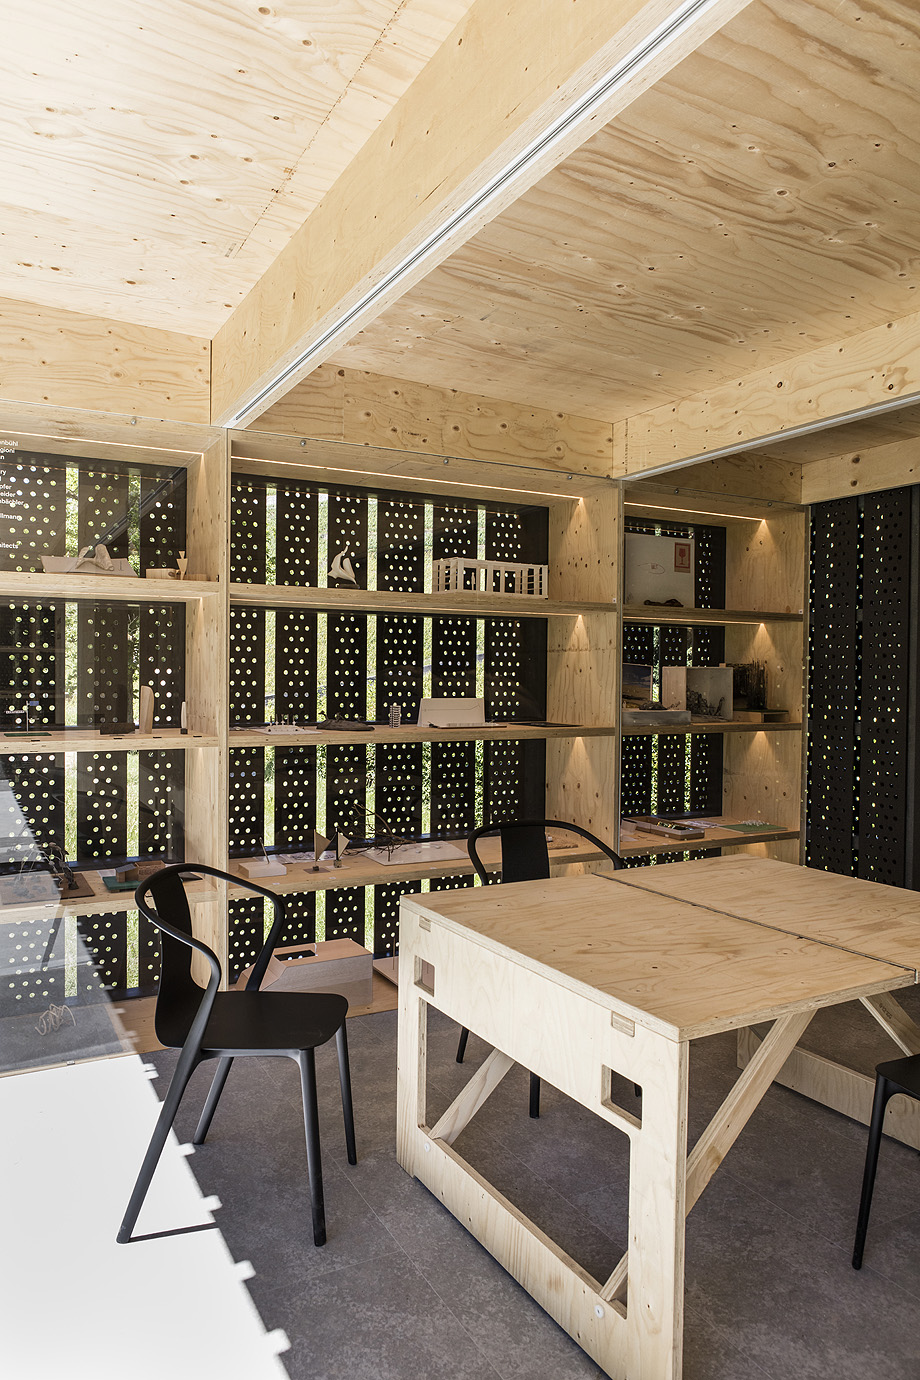 bex & arts pavilion de montalba architects - foto delphine burtin (2)